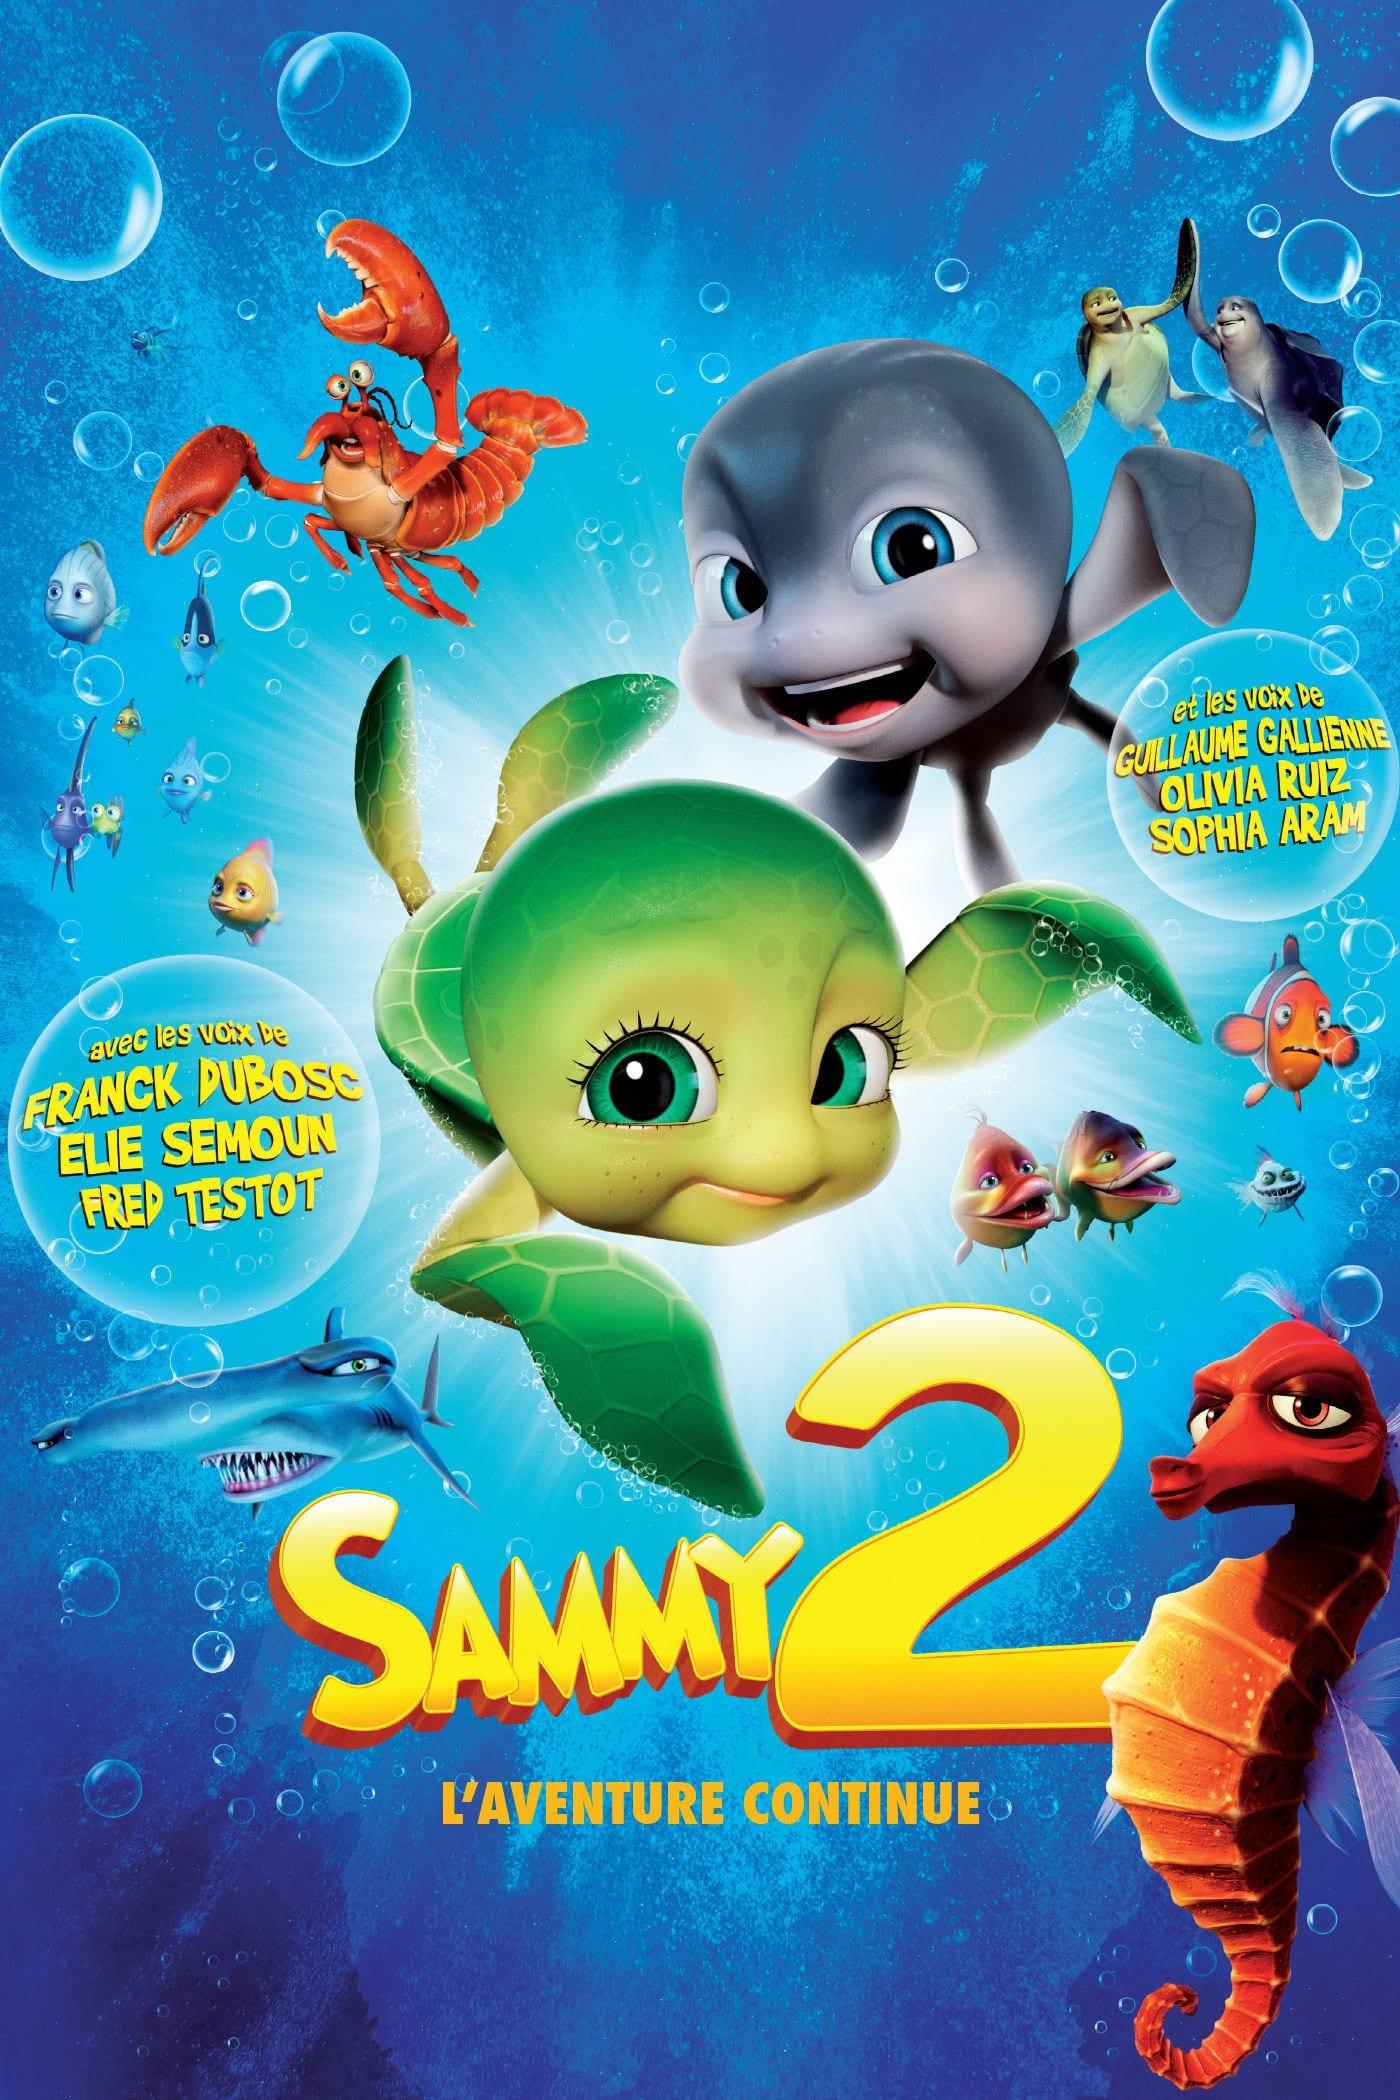 Regarder Sammy 2 en streaming gratuit